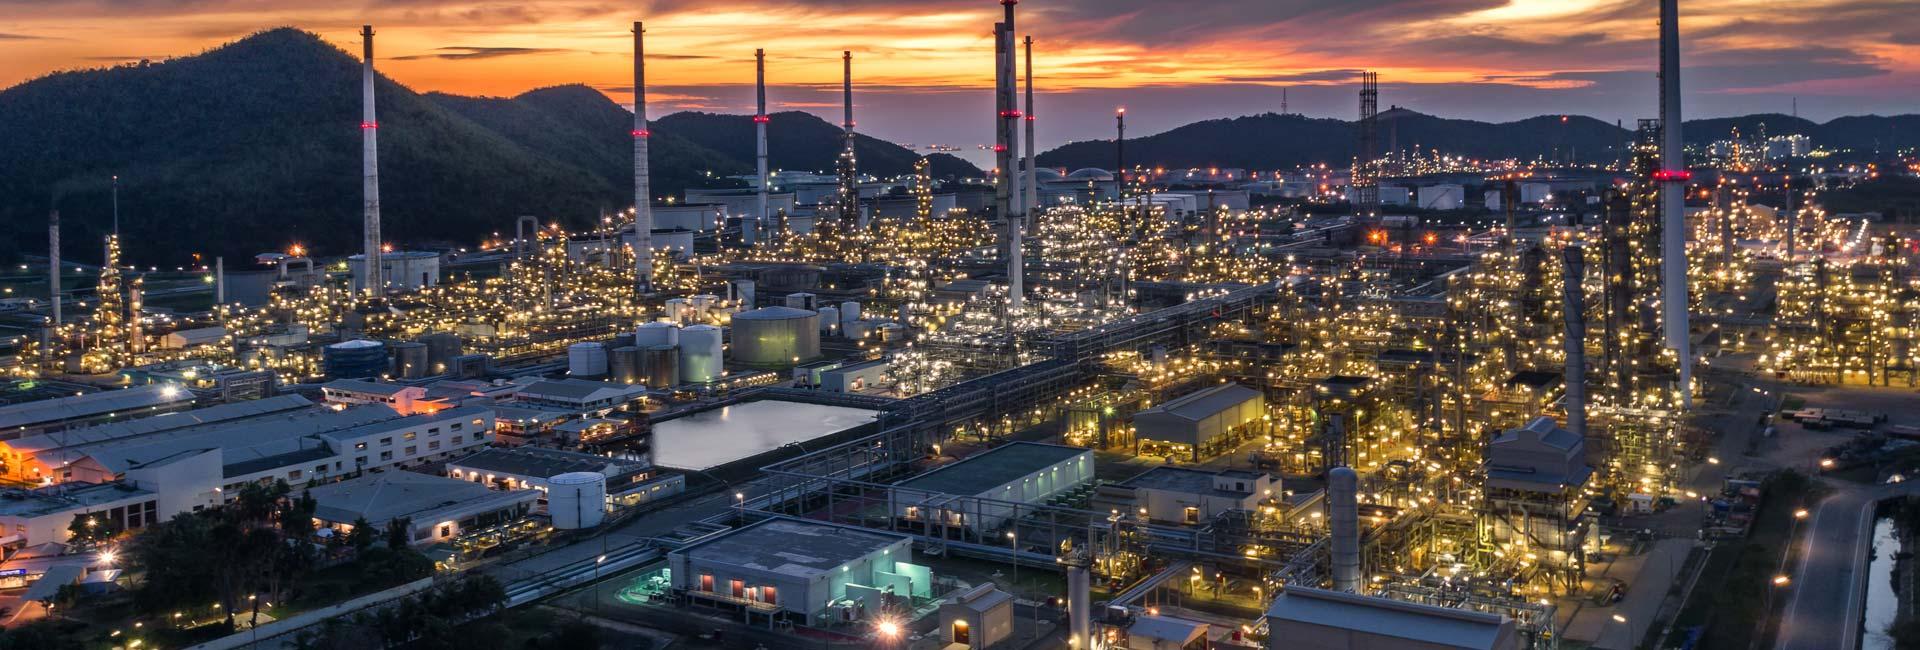 Preventing Petrochemical Process Failure Using AI